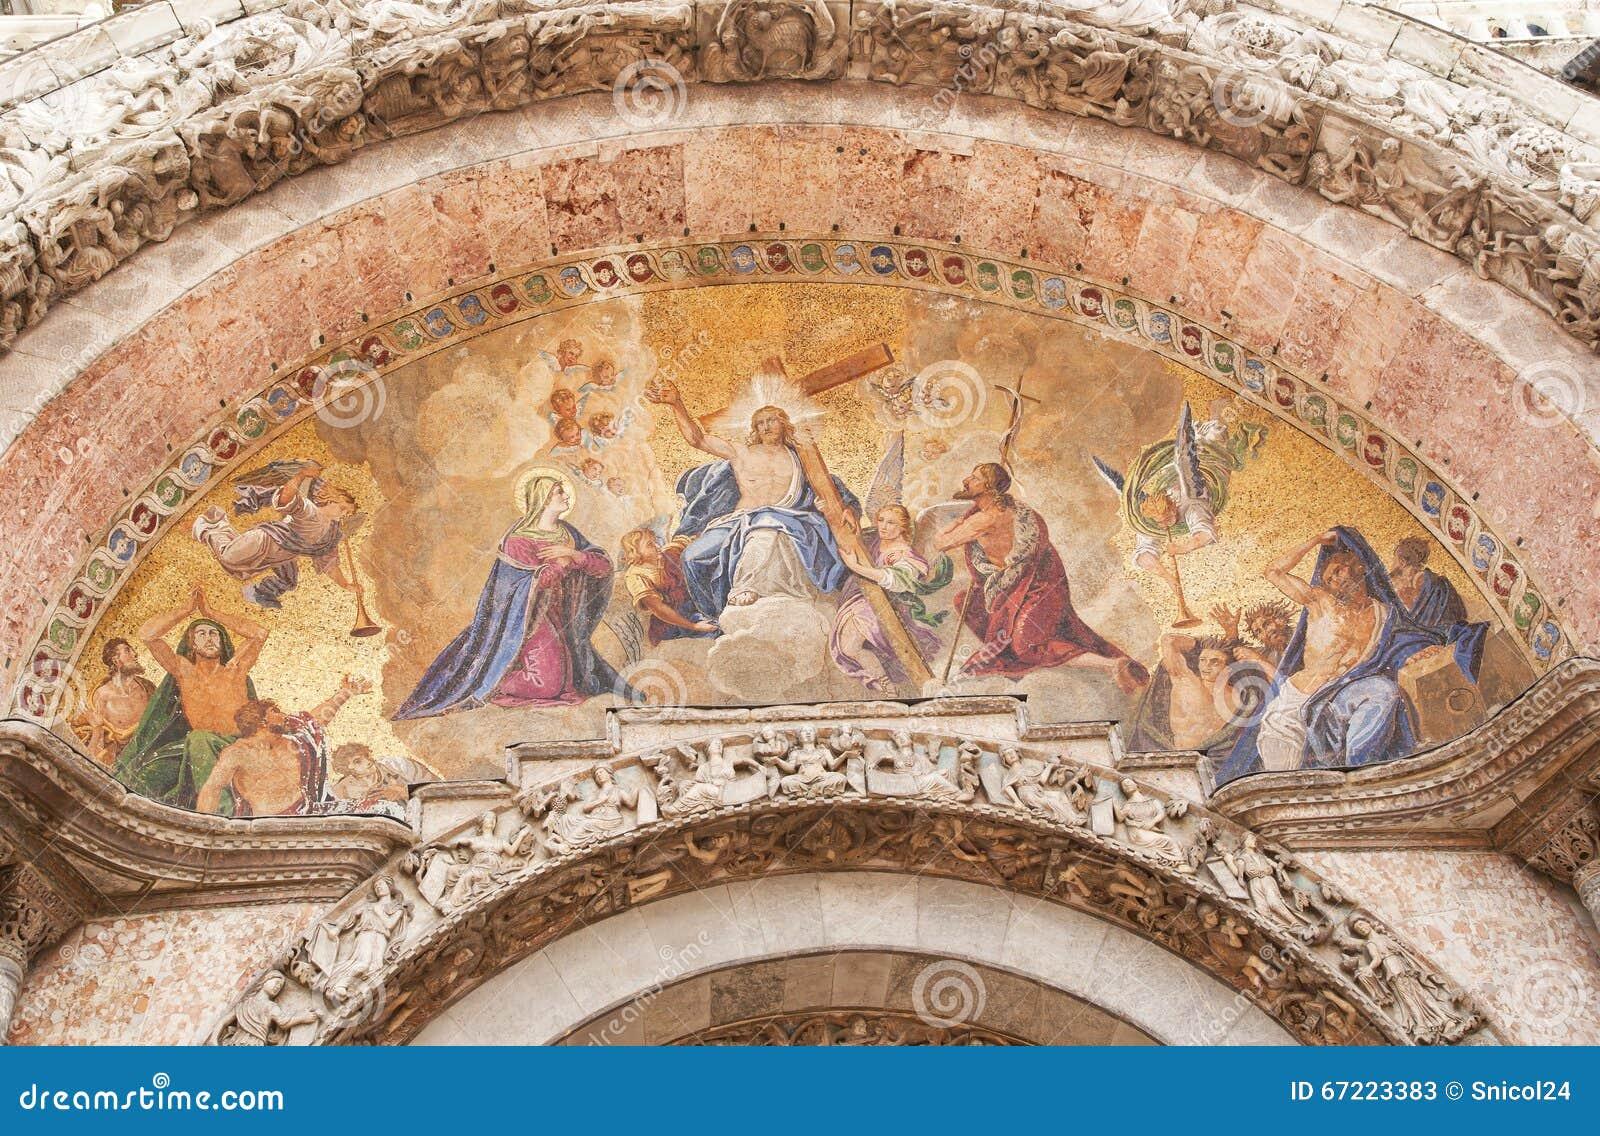 Basilica San Marco Royalty-Free Stock Image  CartoonDealer.com #80537830